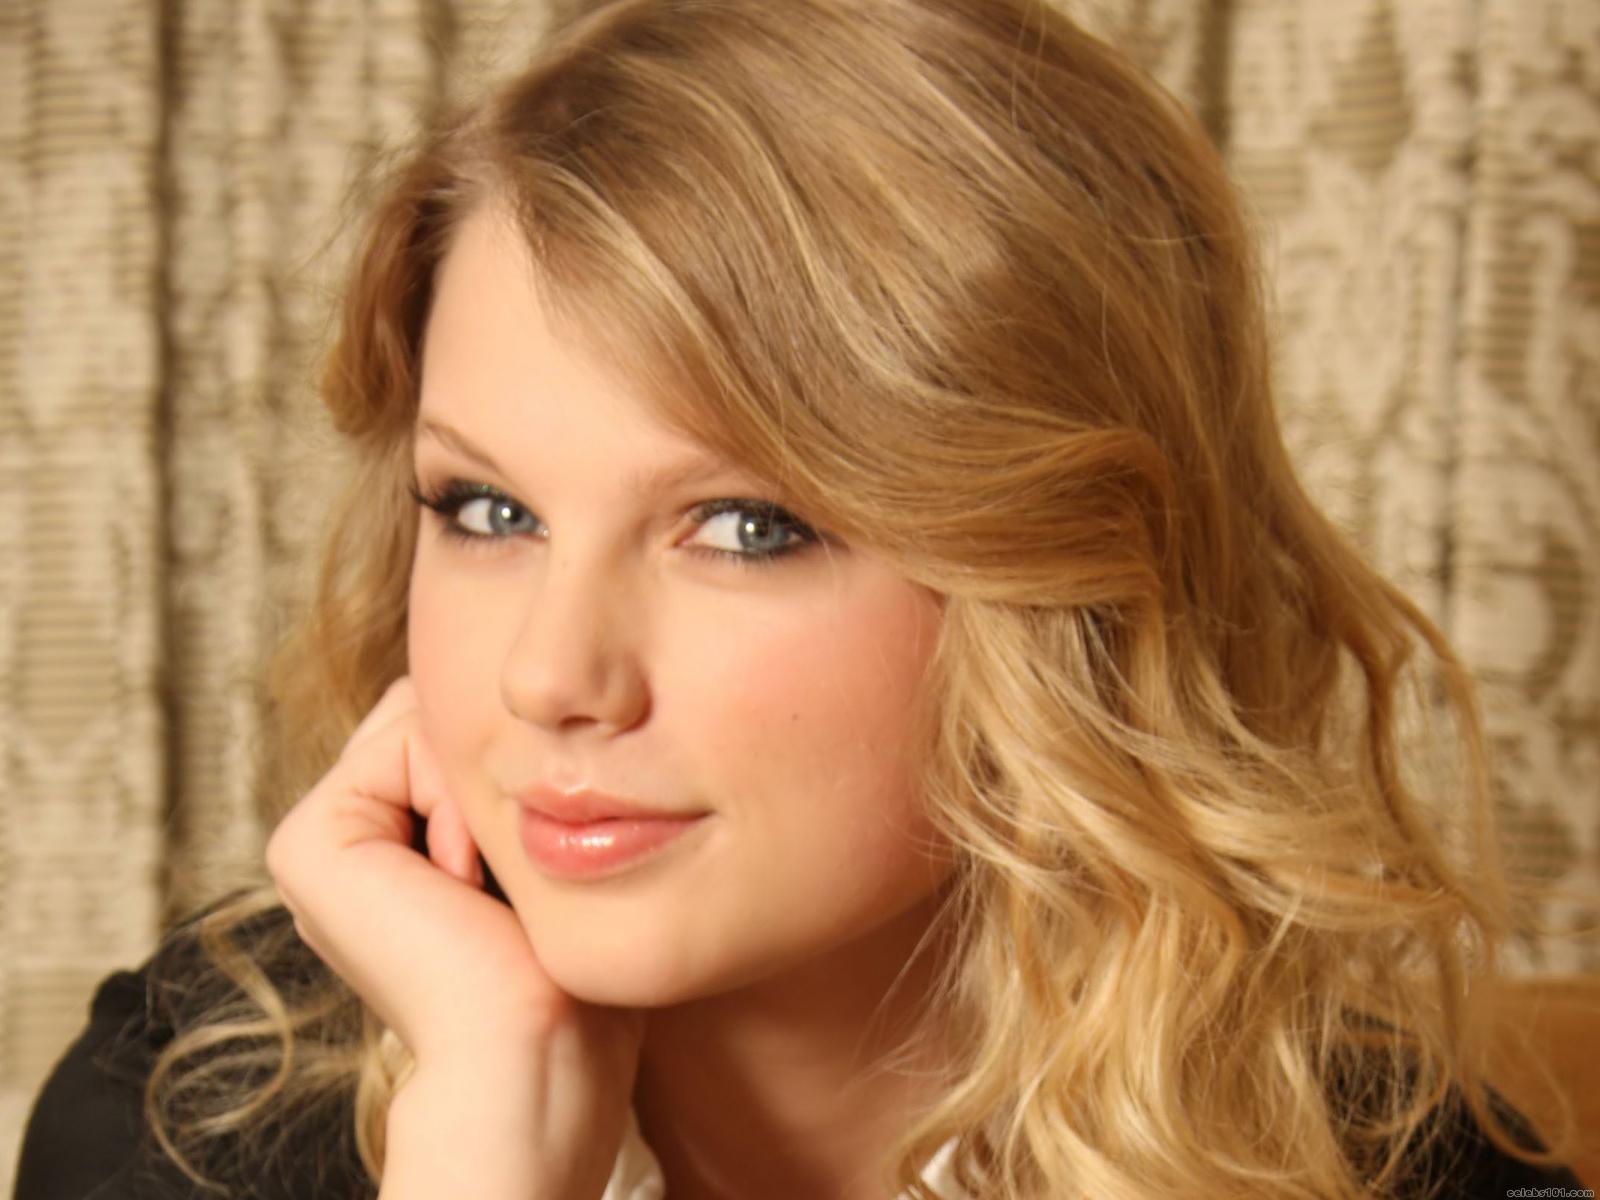 http://1.bp.blogspot.com/_V26e7bIgIY4/TApP7w5lu7I/AAAAAAAABF4/IftxpJfOKPs/s1600/Taylor_Swift_10.jpg